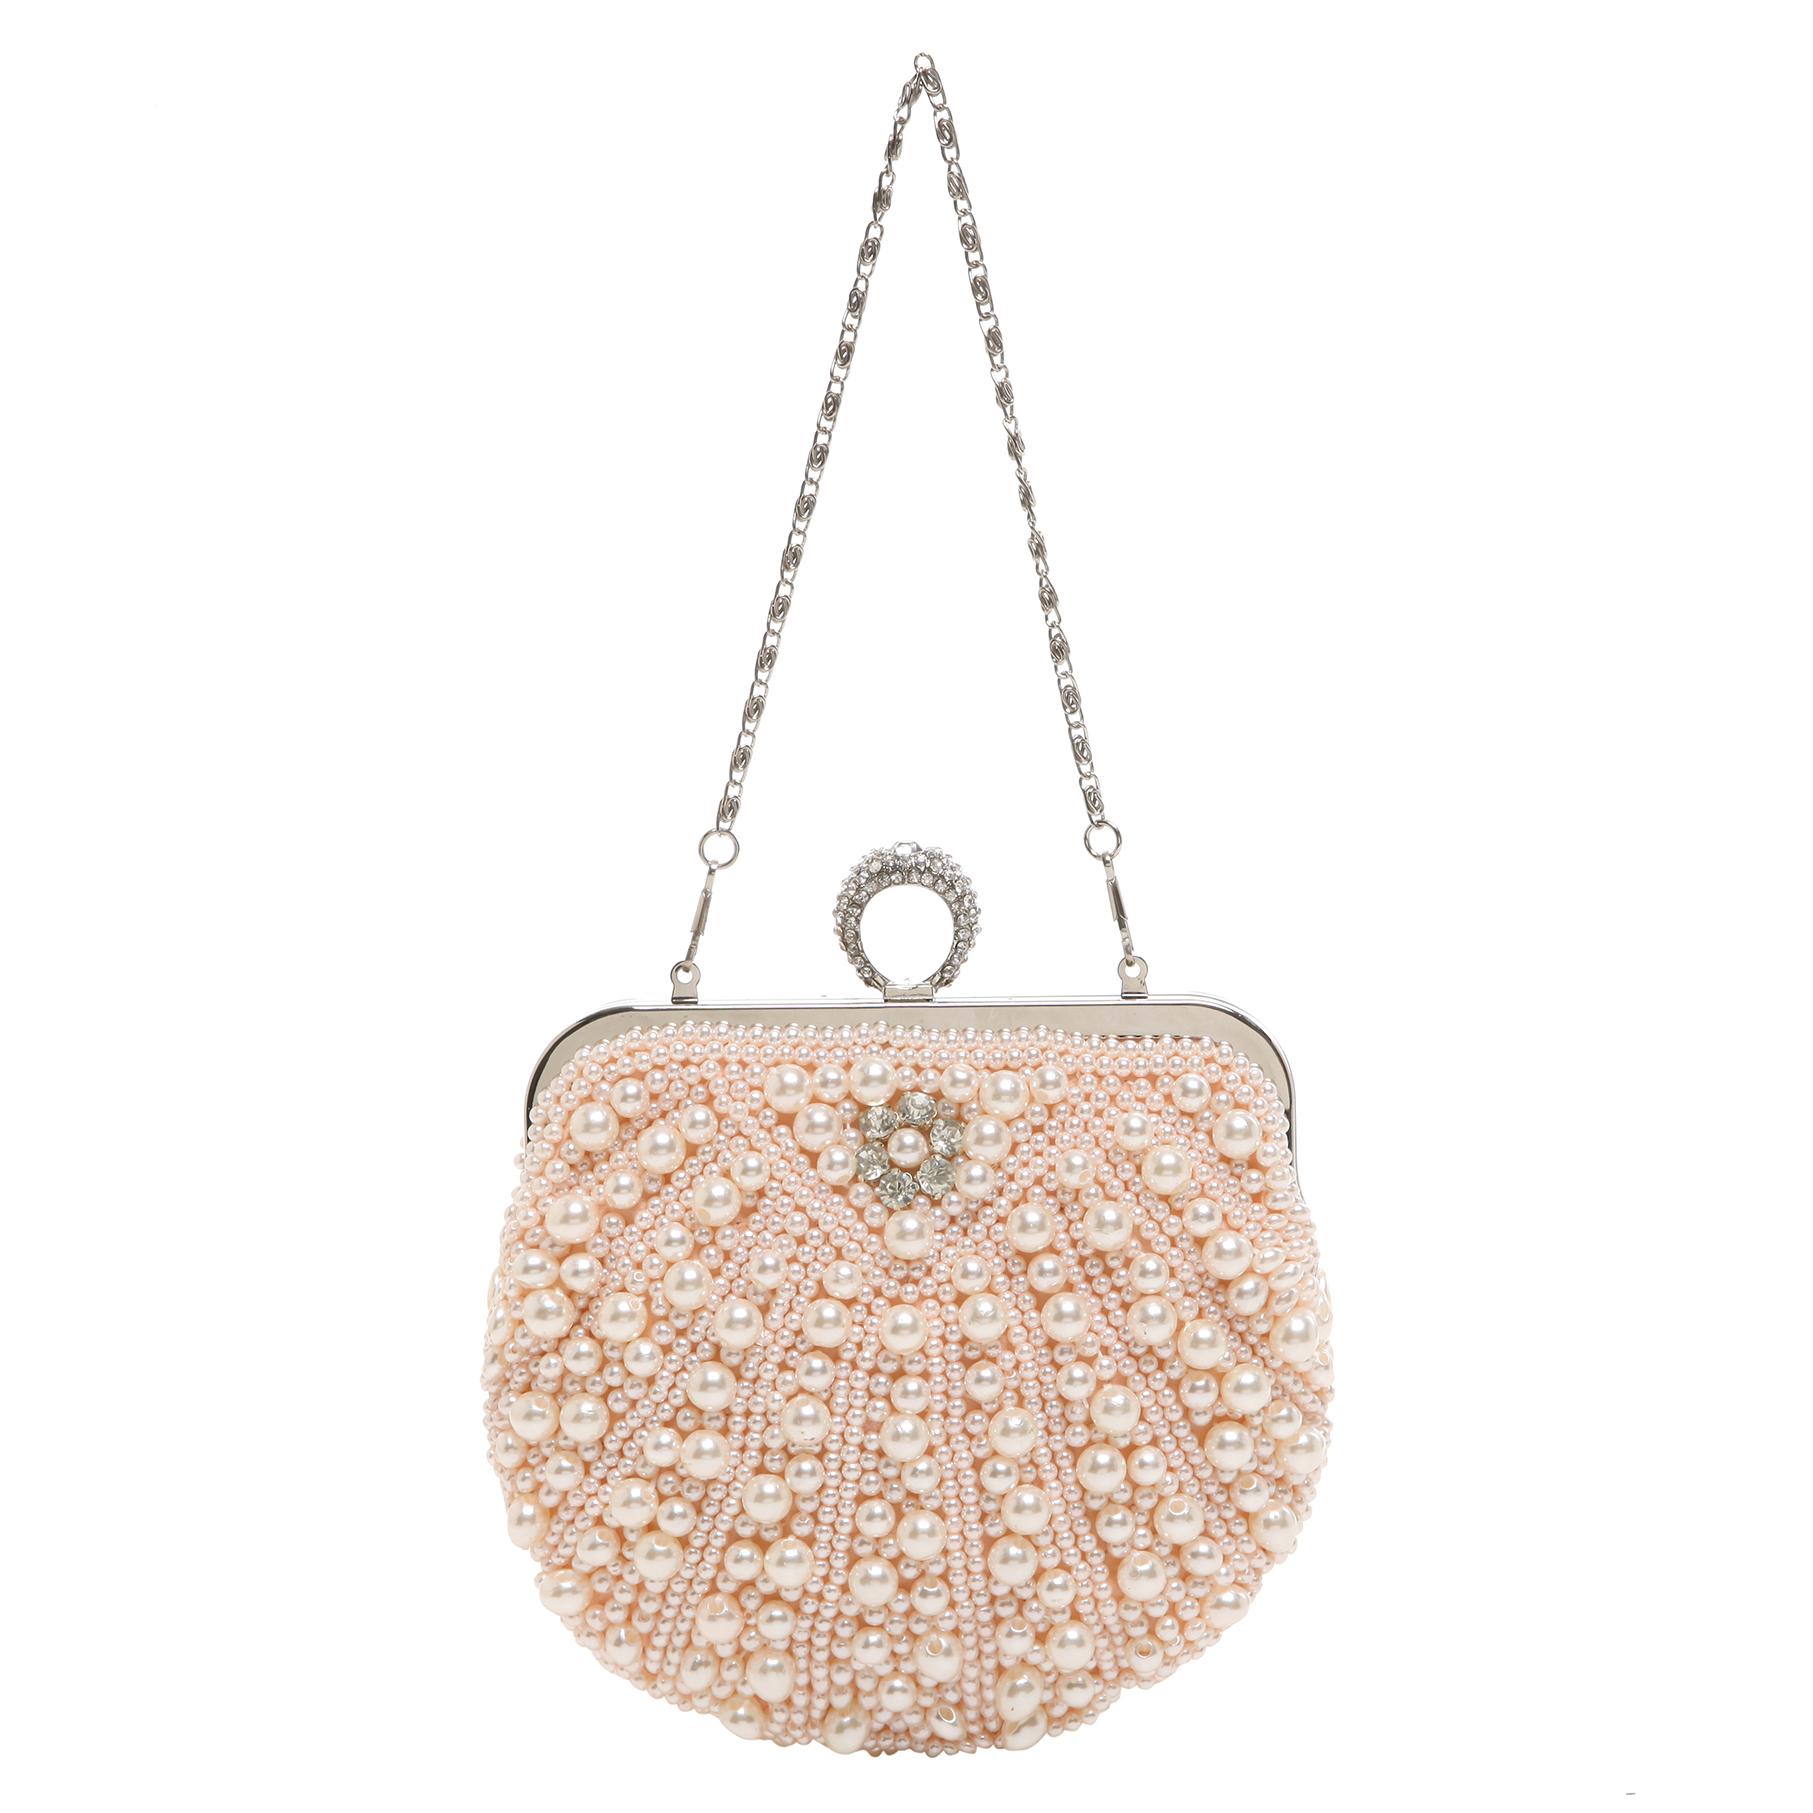 TIANA Champagne Pearl Rhinestone Evening Bag short strap